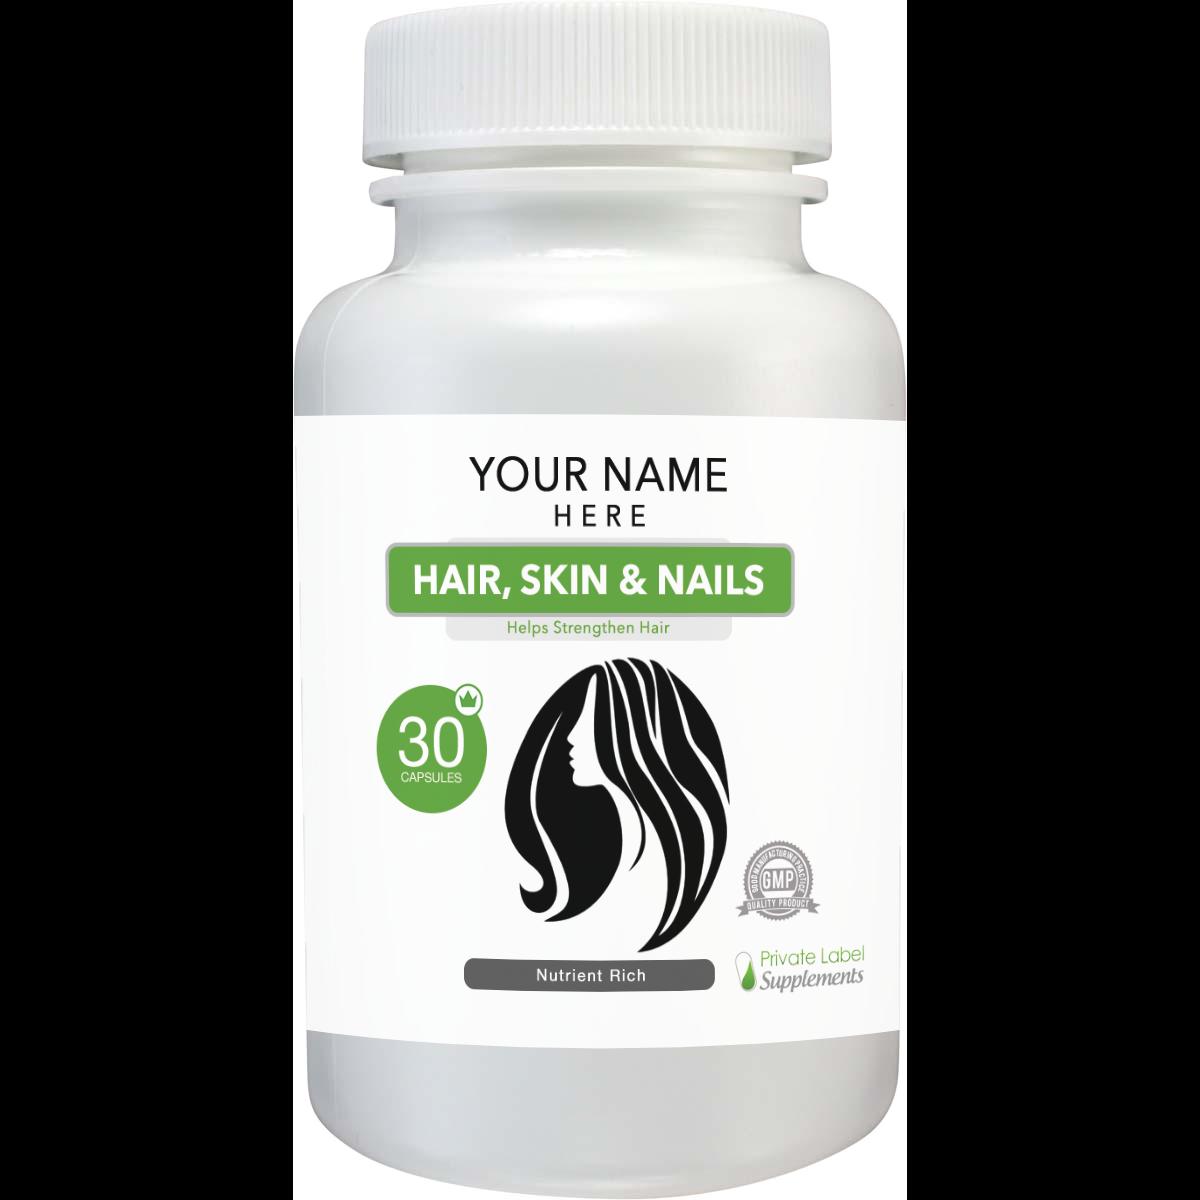 Hair, Skin & Nails Tablets Hair growth nutrients, Hair